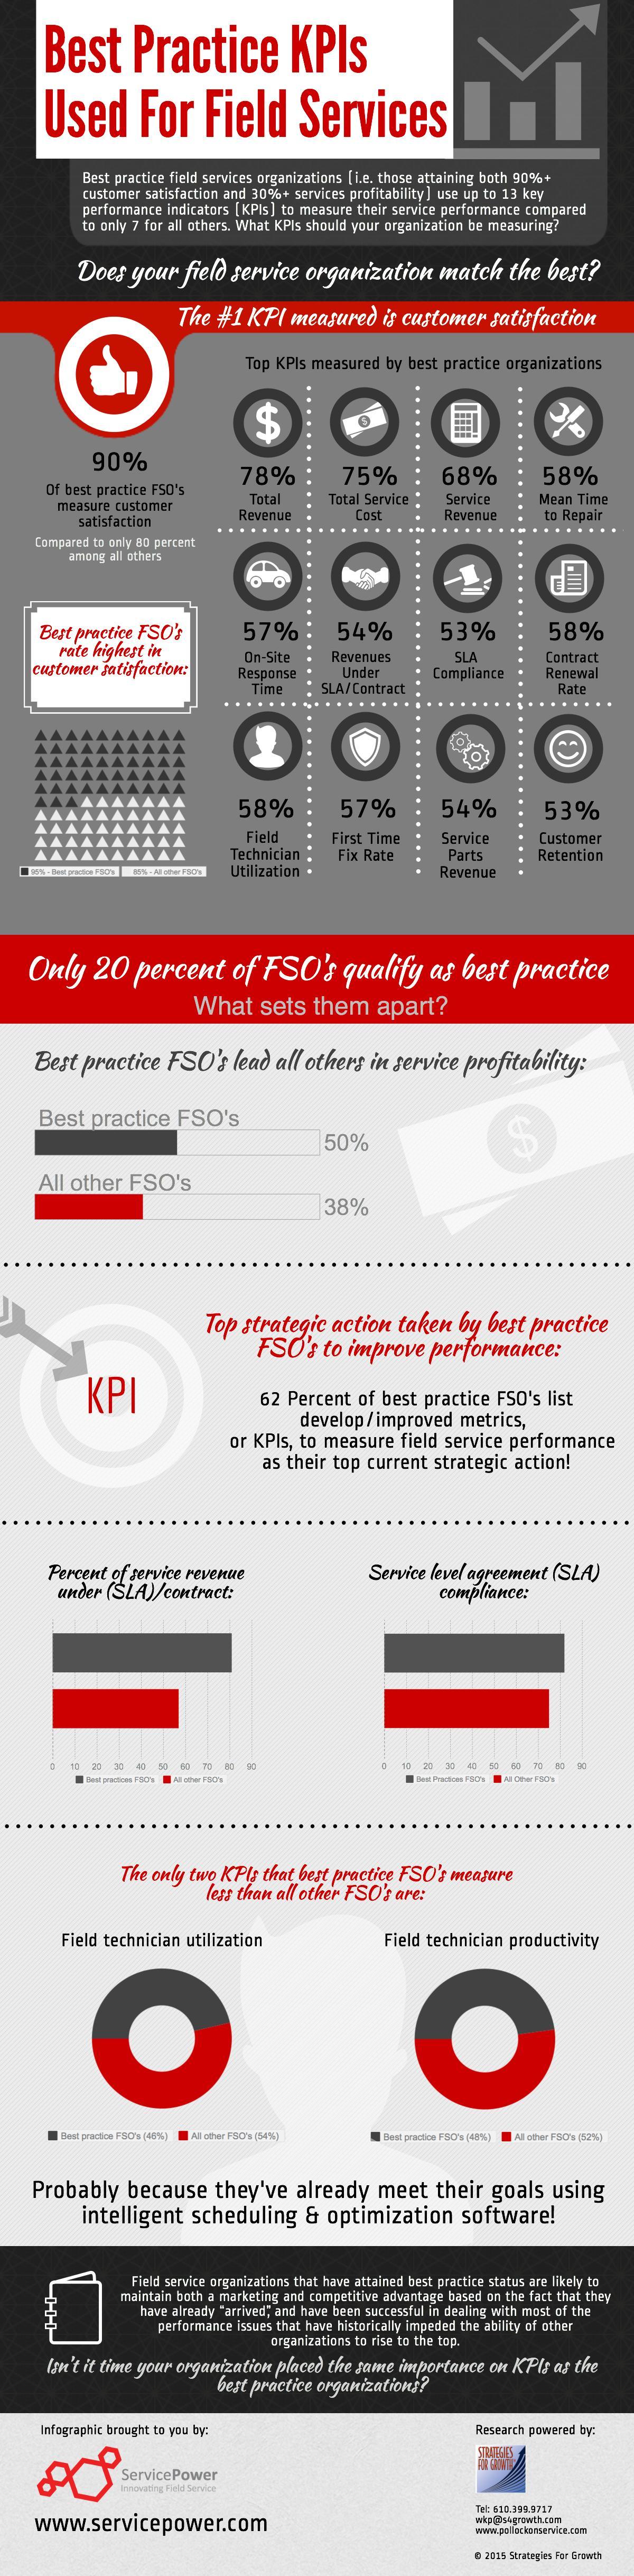 KPI_Infographic-1.jpeg